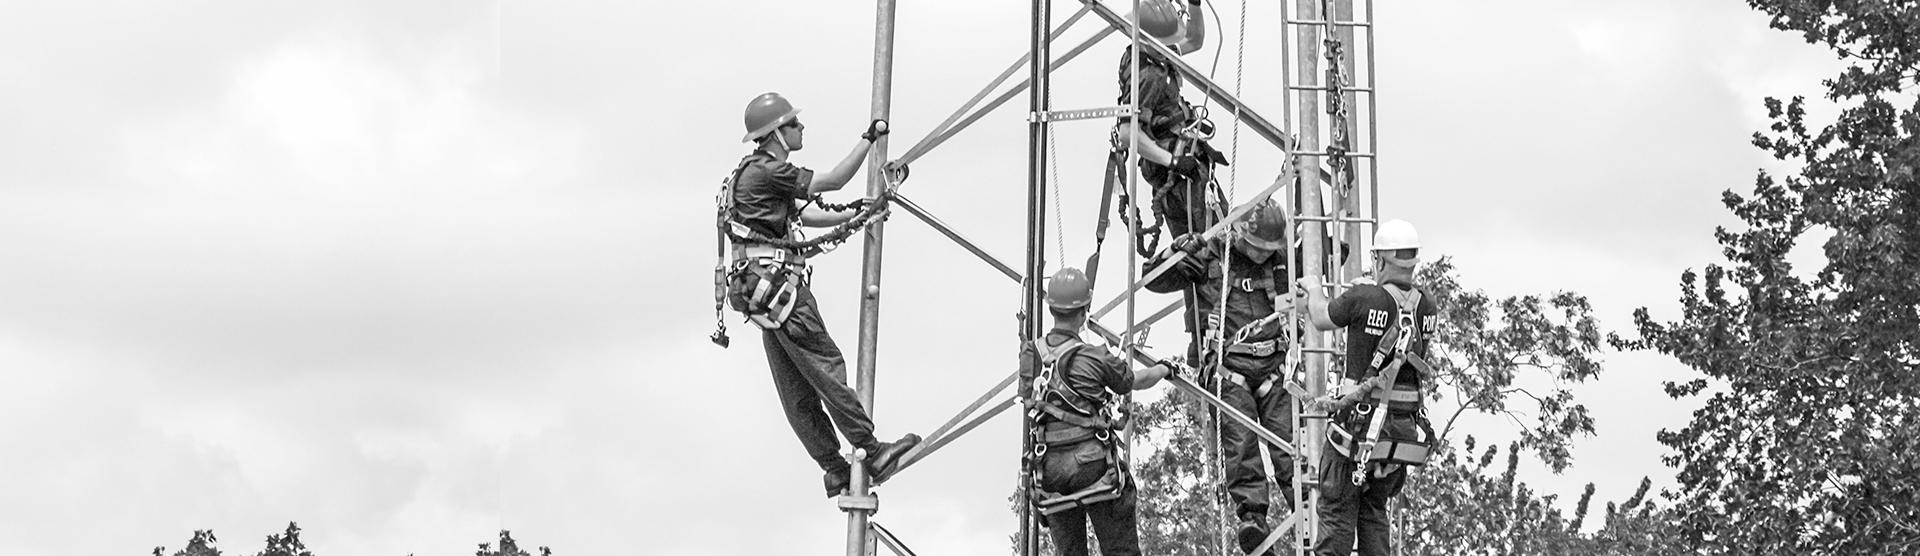 Training Sluniversal Wire Harness